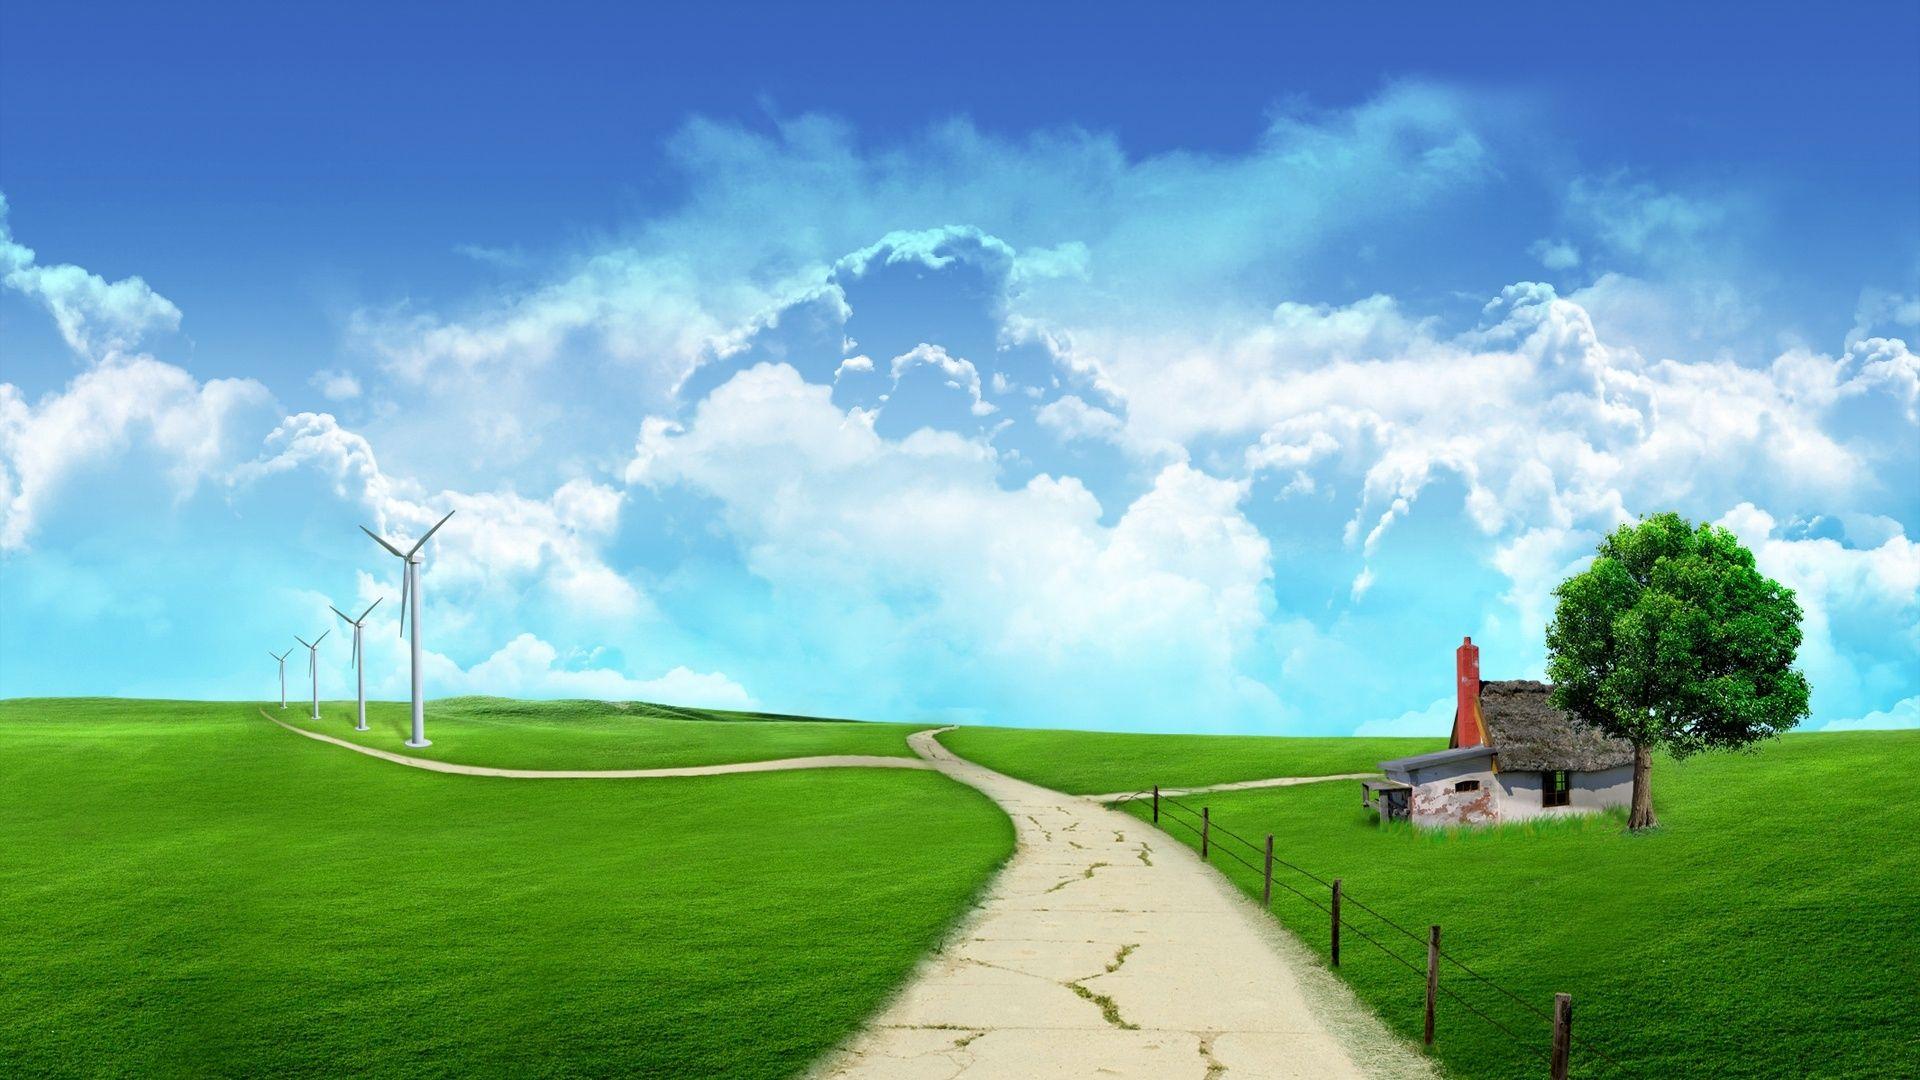 3D Landscape Wallpaper - WallpaperSafari